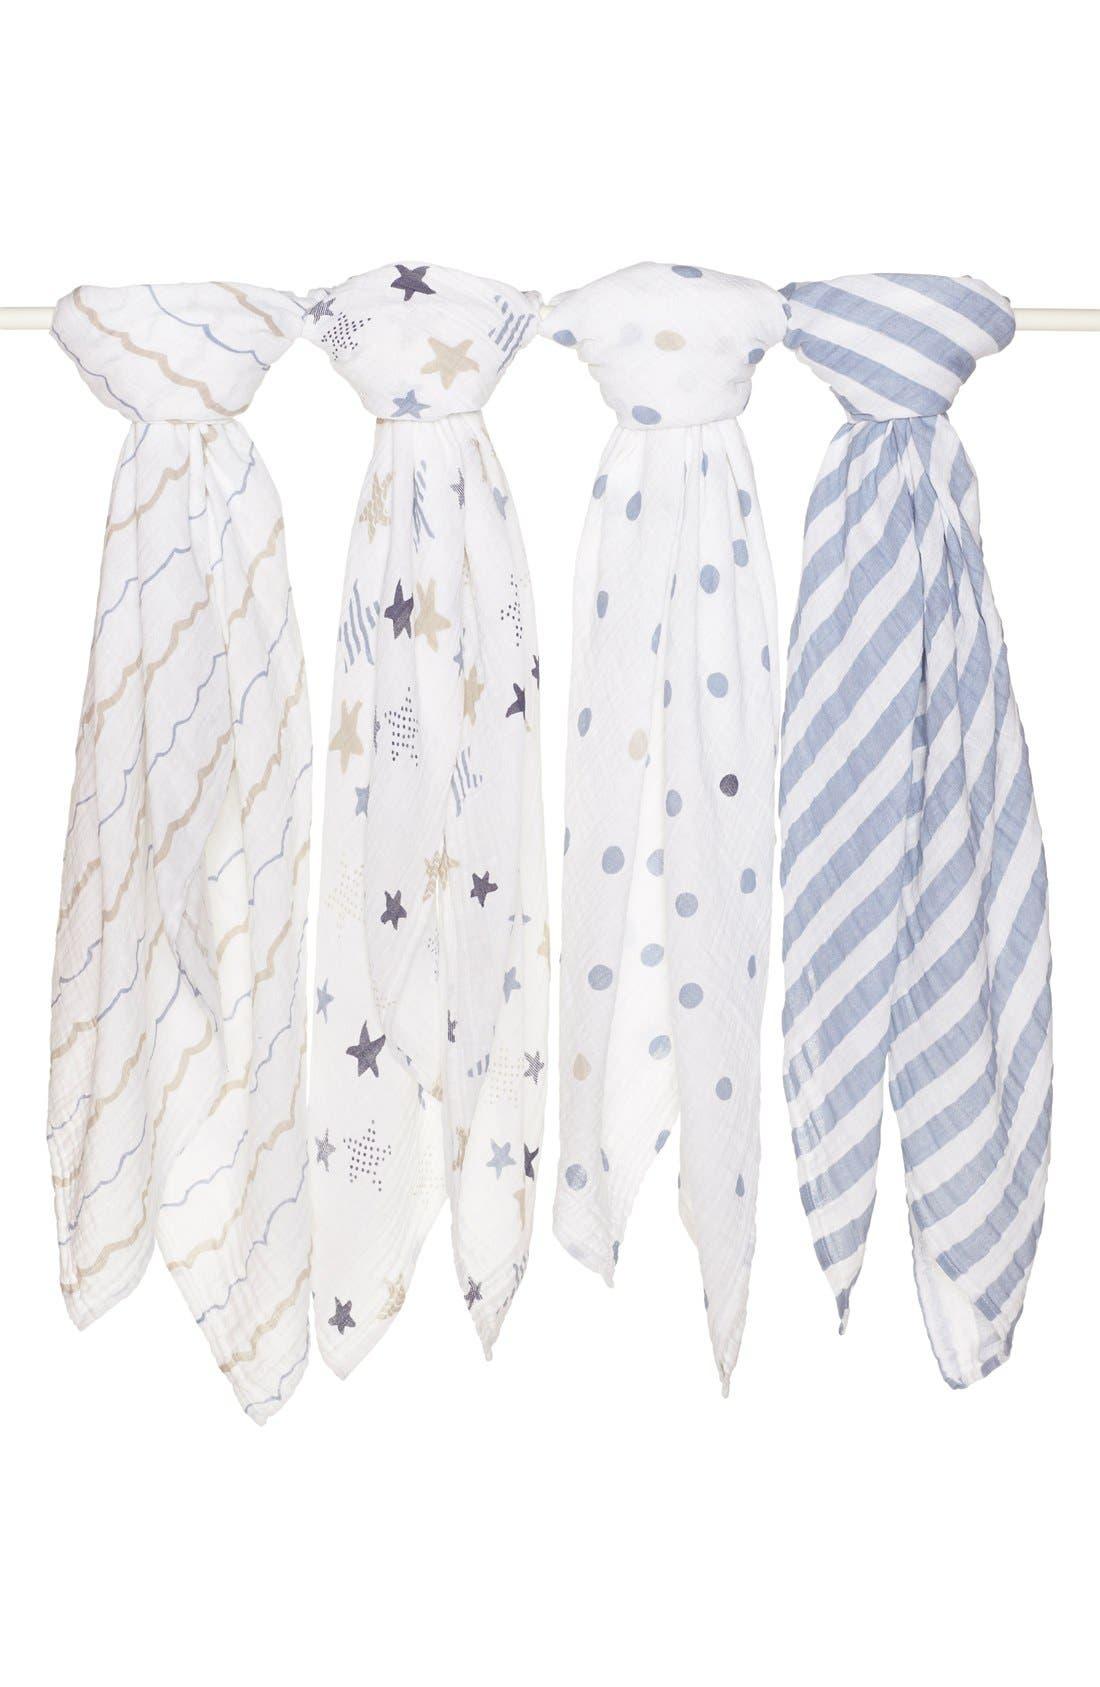 aden + anais Set of 4 Classic Swaddling Cloths